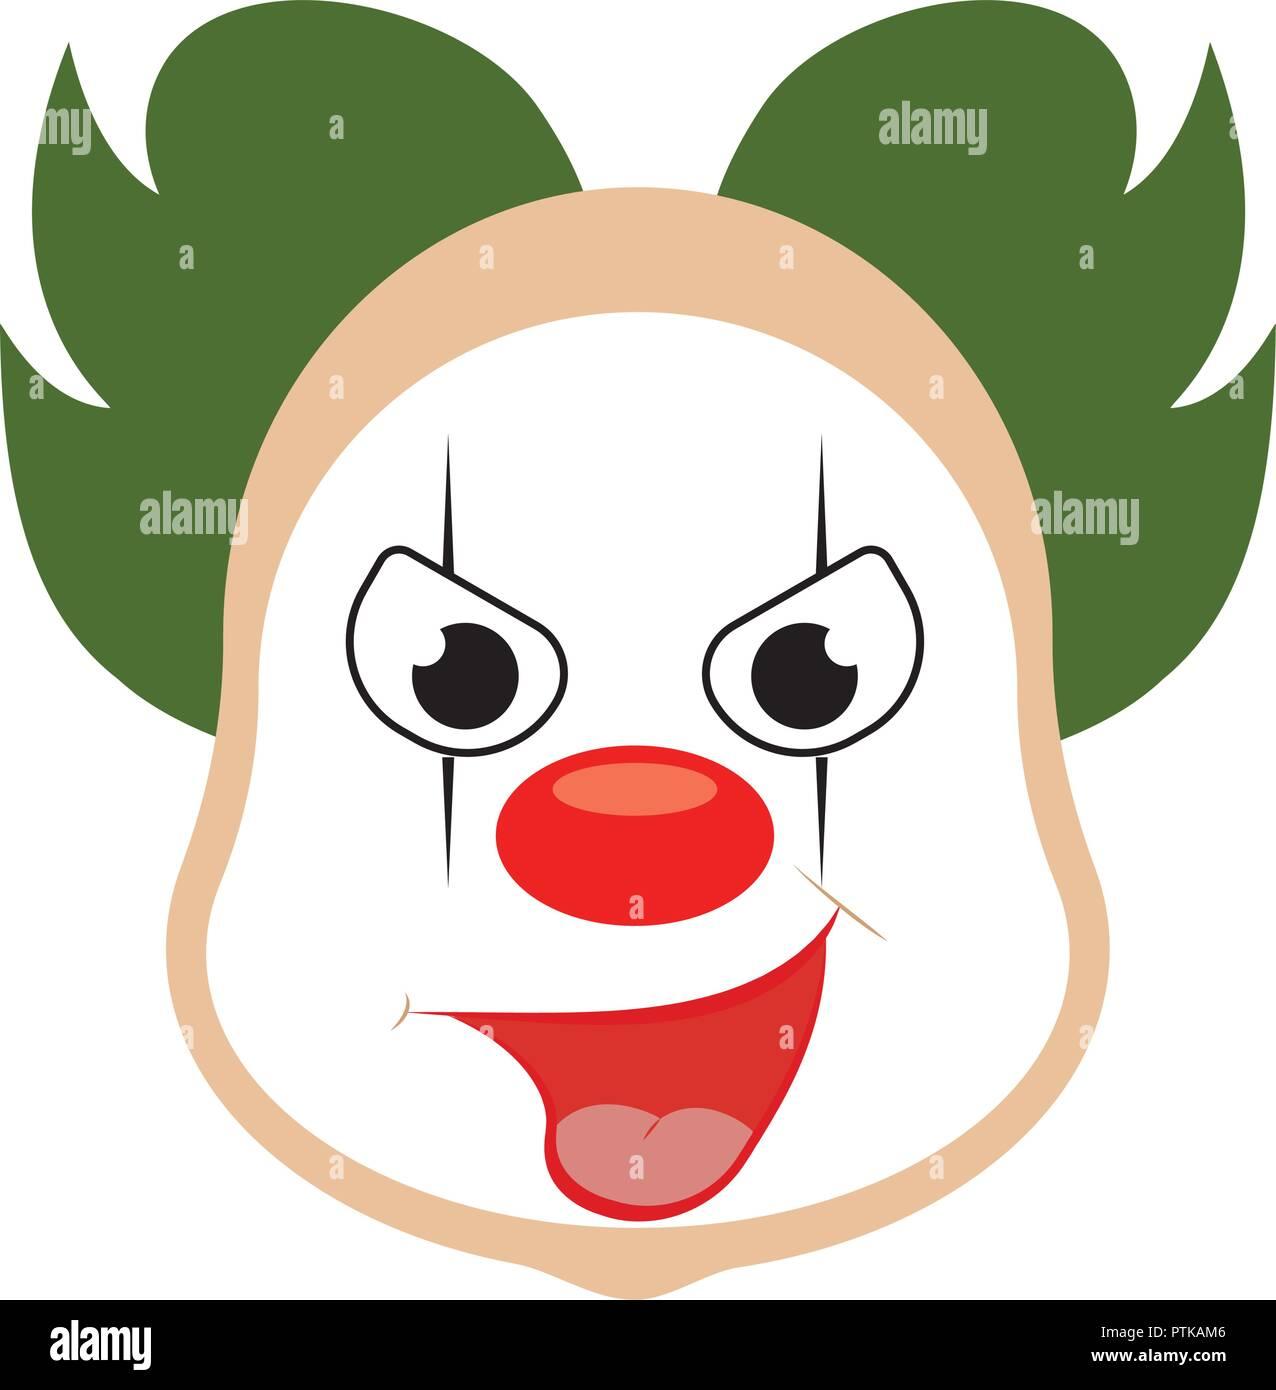 Dessin Visage Halloween.Cartoon Halloween Mask Stock Vector Image Art Alamy